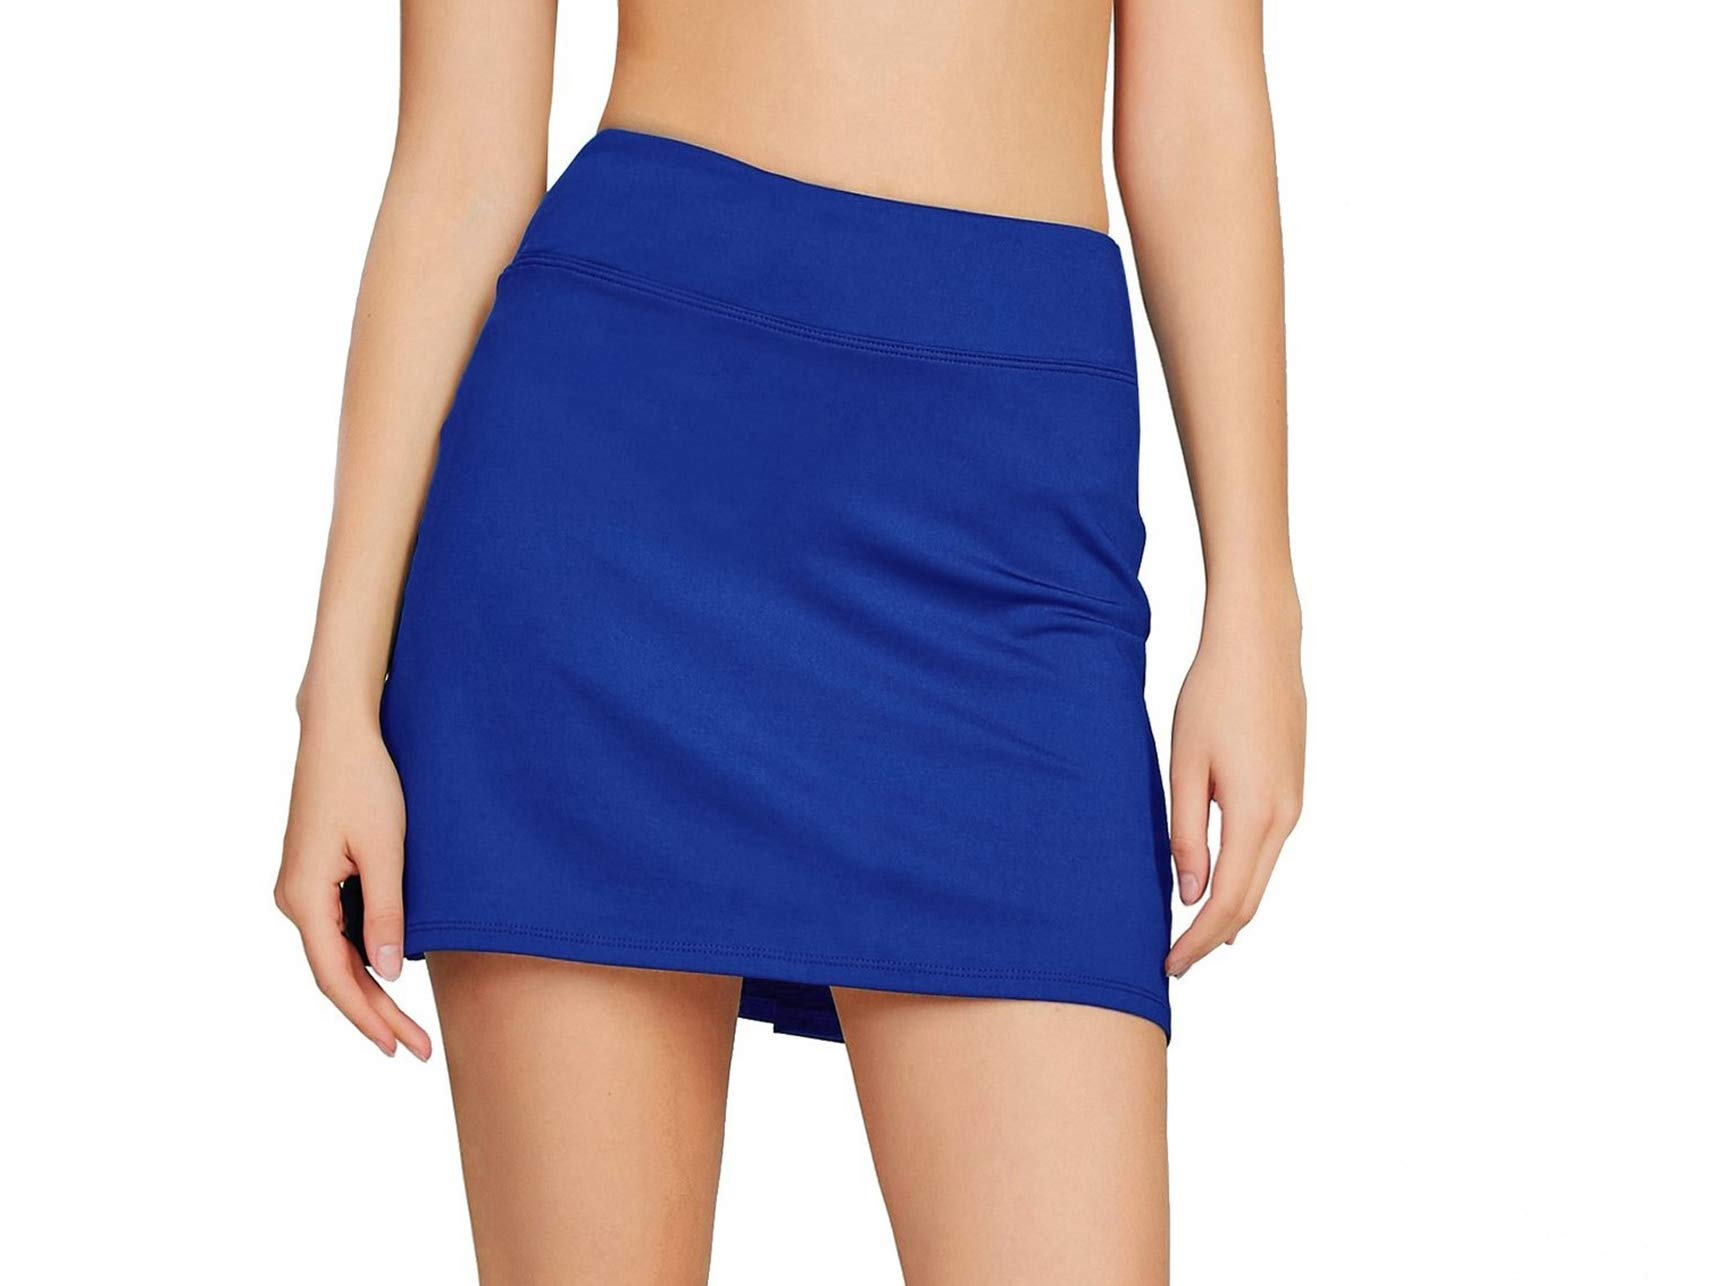 Women's Casual Pleated Tennis Golf Skirt with Underneath Shorts Running Skorts bu xs Blue